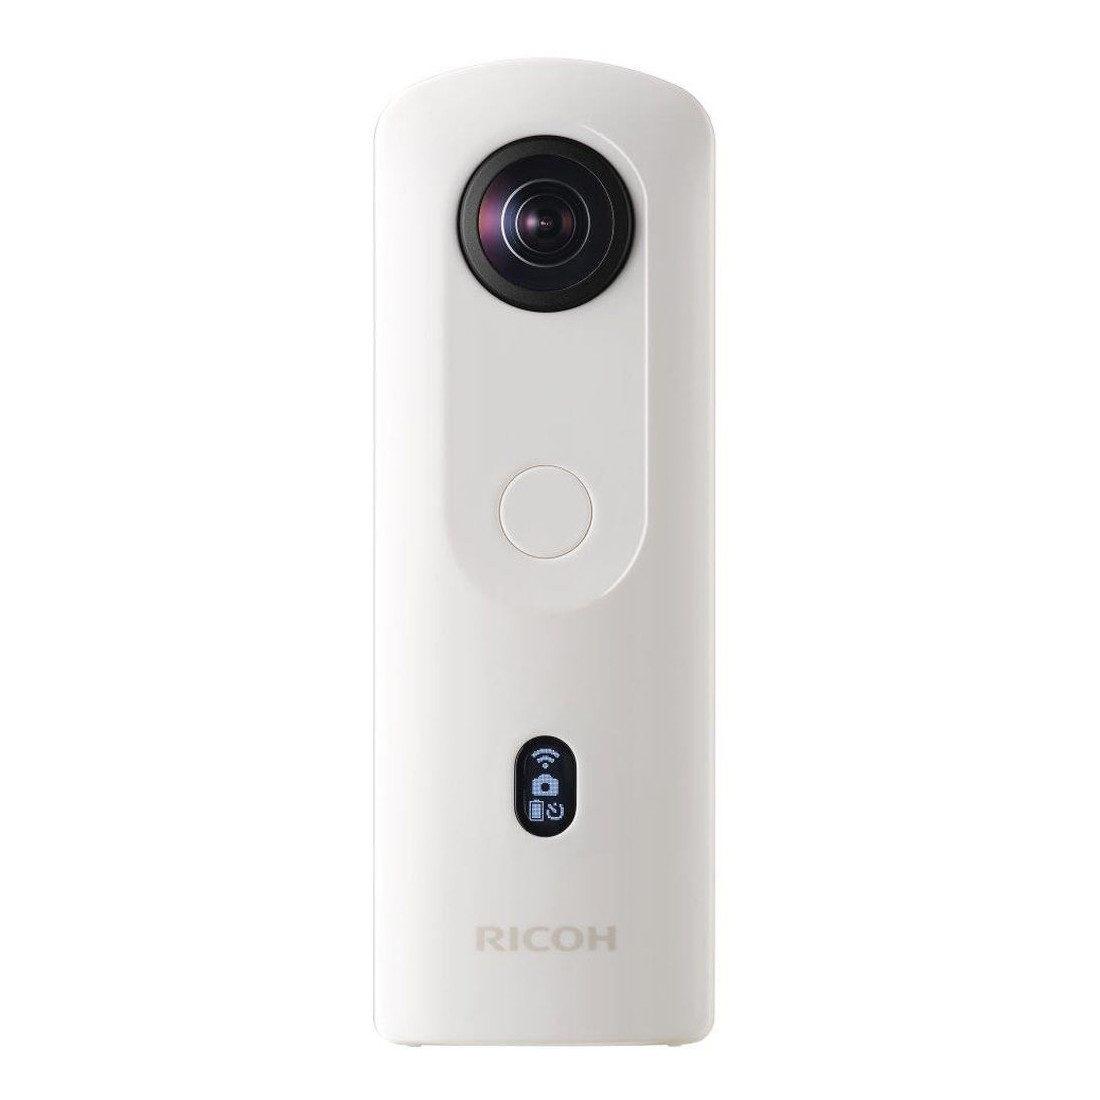 Ricoh Theta SC2 360-graden camera Wit <br/>€ 299.00 <br/> <a href='https://www.cameranu.nl/fotografie/?tt=12190_474631_241358_&r=https%3A%2F%2Fwww.cameranu.nl%2Fnl%2Fp3141827%2Fricoh-theta-sc2-360-graden-camera-wit%3Fchannable%3De10841.MzE0MTgyNw%26utm_campaign%3D%26utm_content%3D360%25C2%25B0%2BTheta%2Bcamera%26utm_source%3DTradetracker%26utm_medium%3Dcpc%26utm_term%3DDigitale%2Bcamera%26apos%3Bs' target='_blank'>naar de winkel</a>